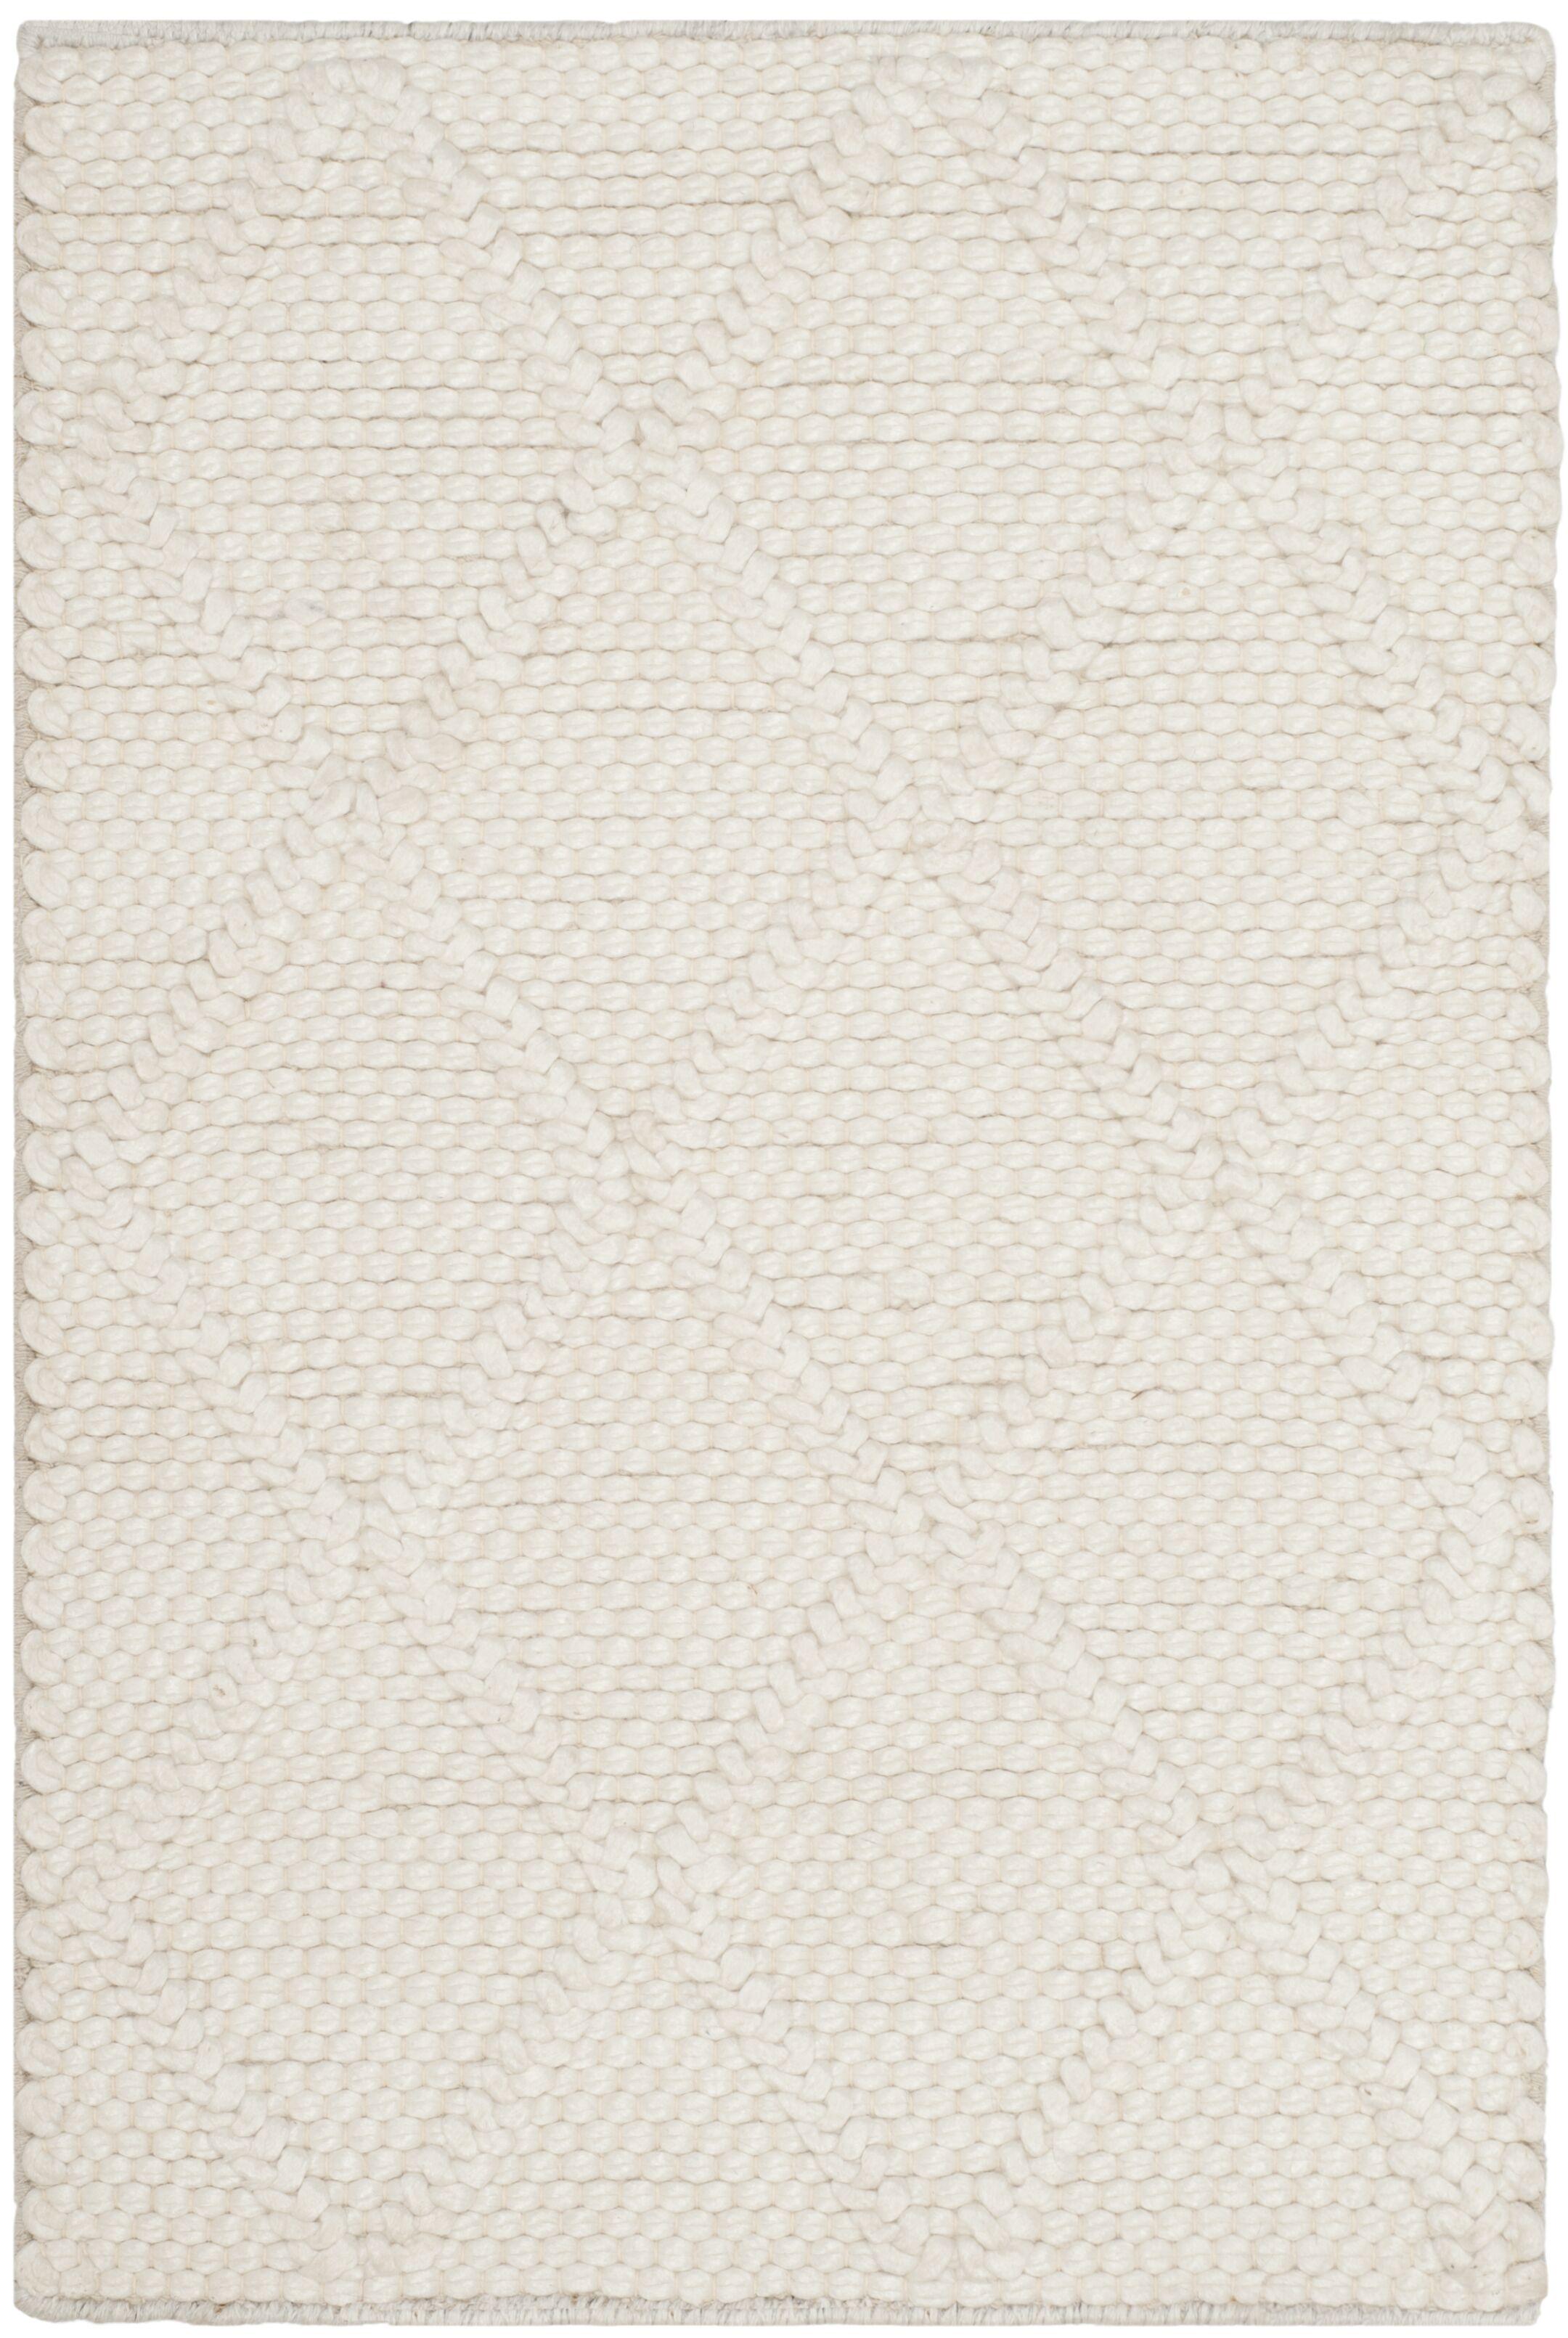 Billie Hand-Tufted Ivory Area Rug Rug Size: Rectangle 5' x 8'